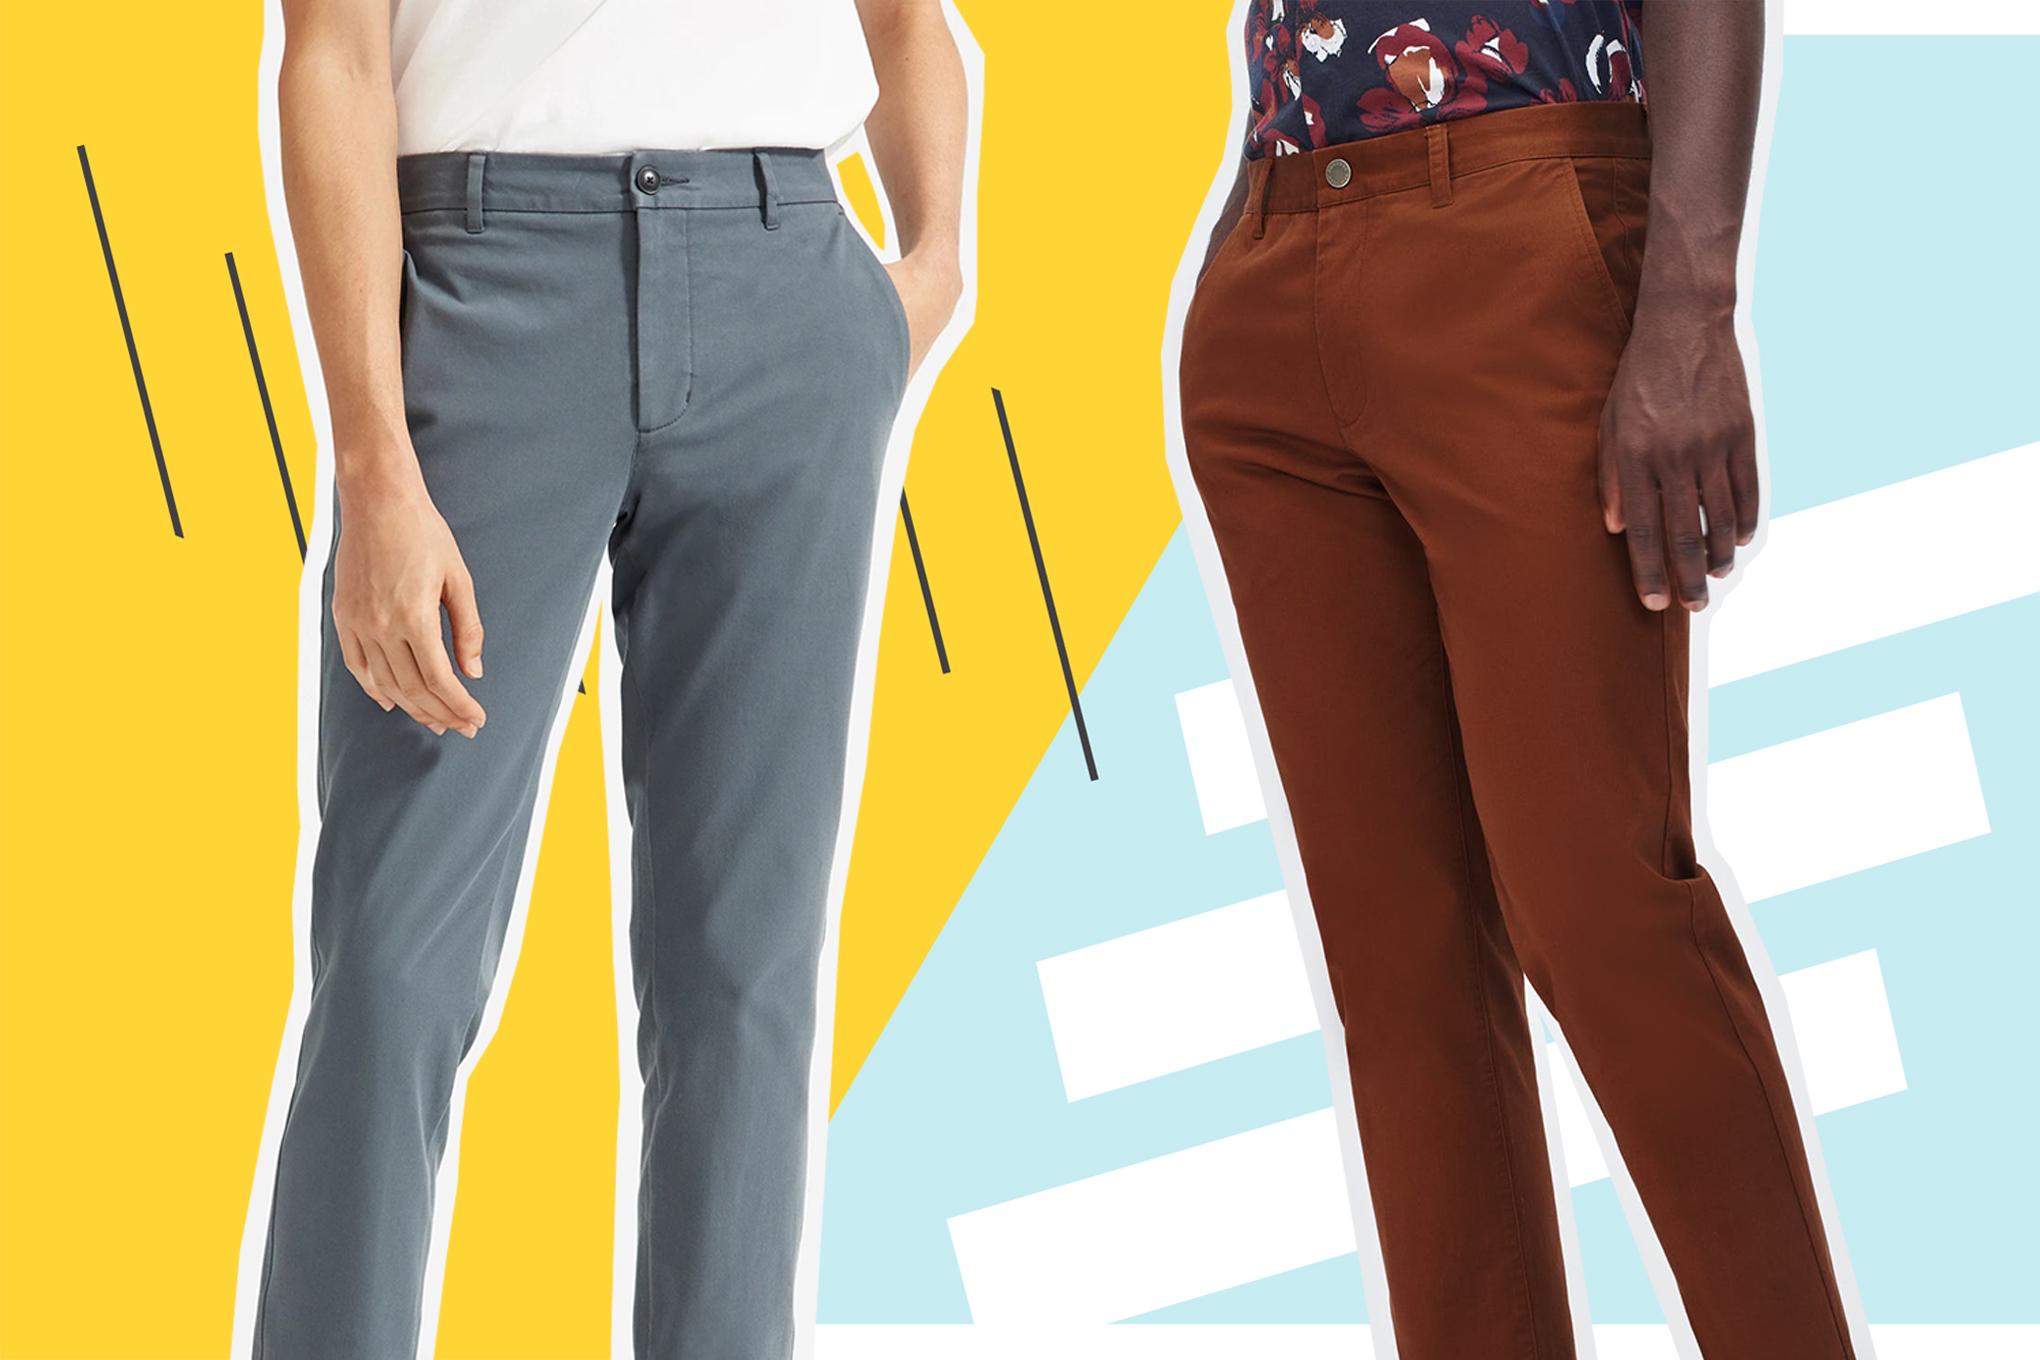 AD Mens Super Skinny Stretch Twills Chinos Trousers Smart Designer Stylish Jeans